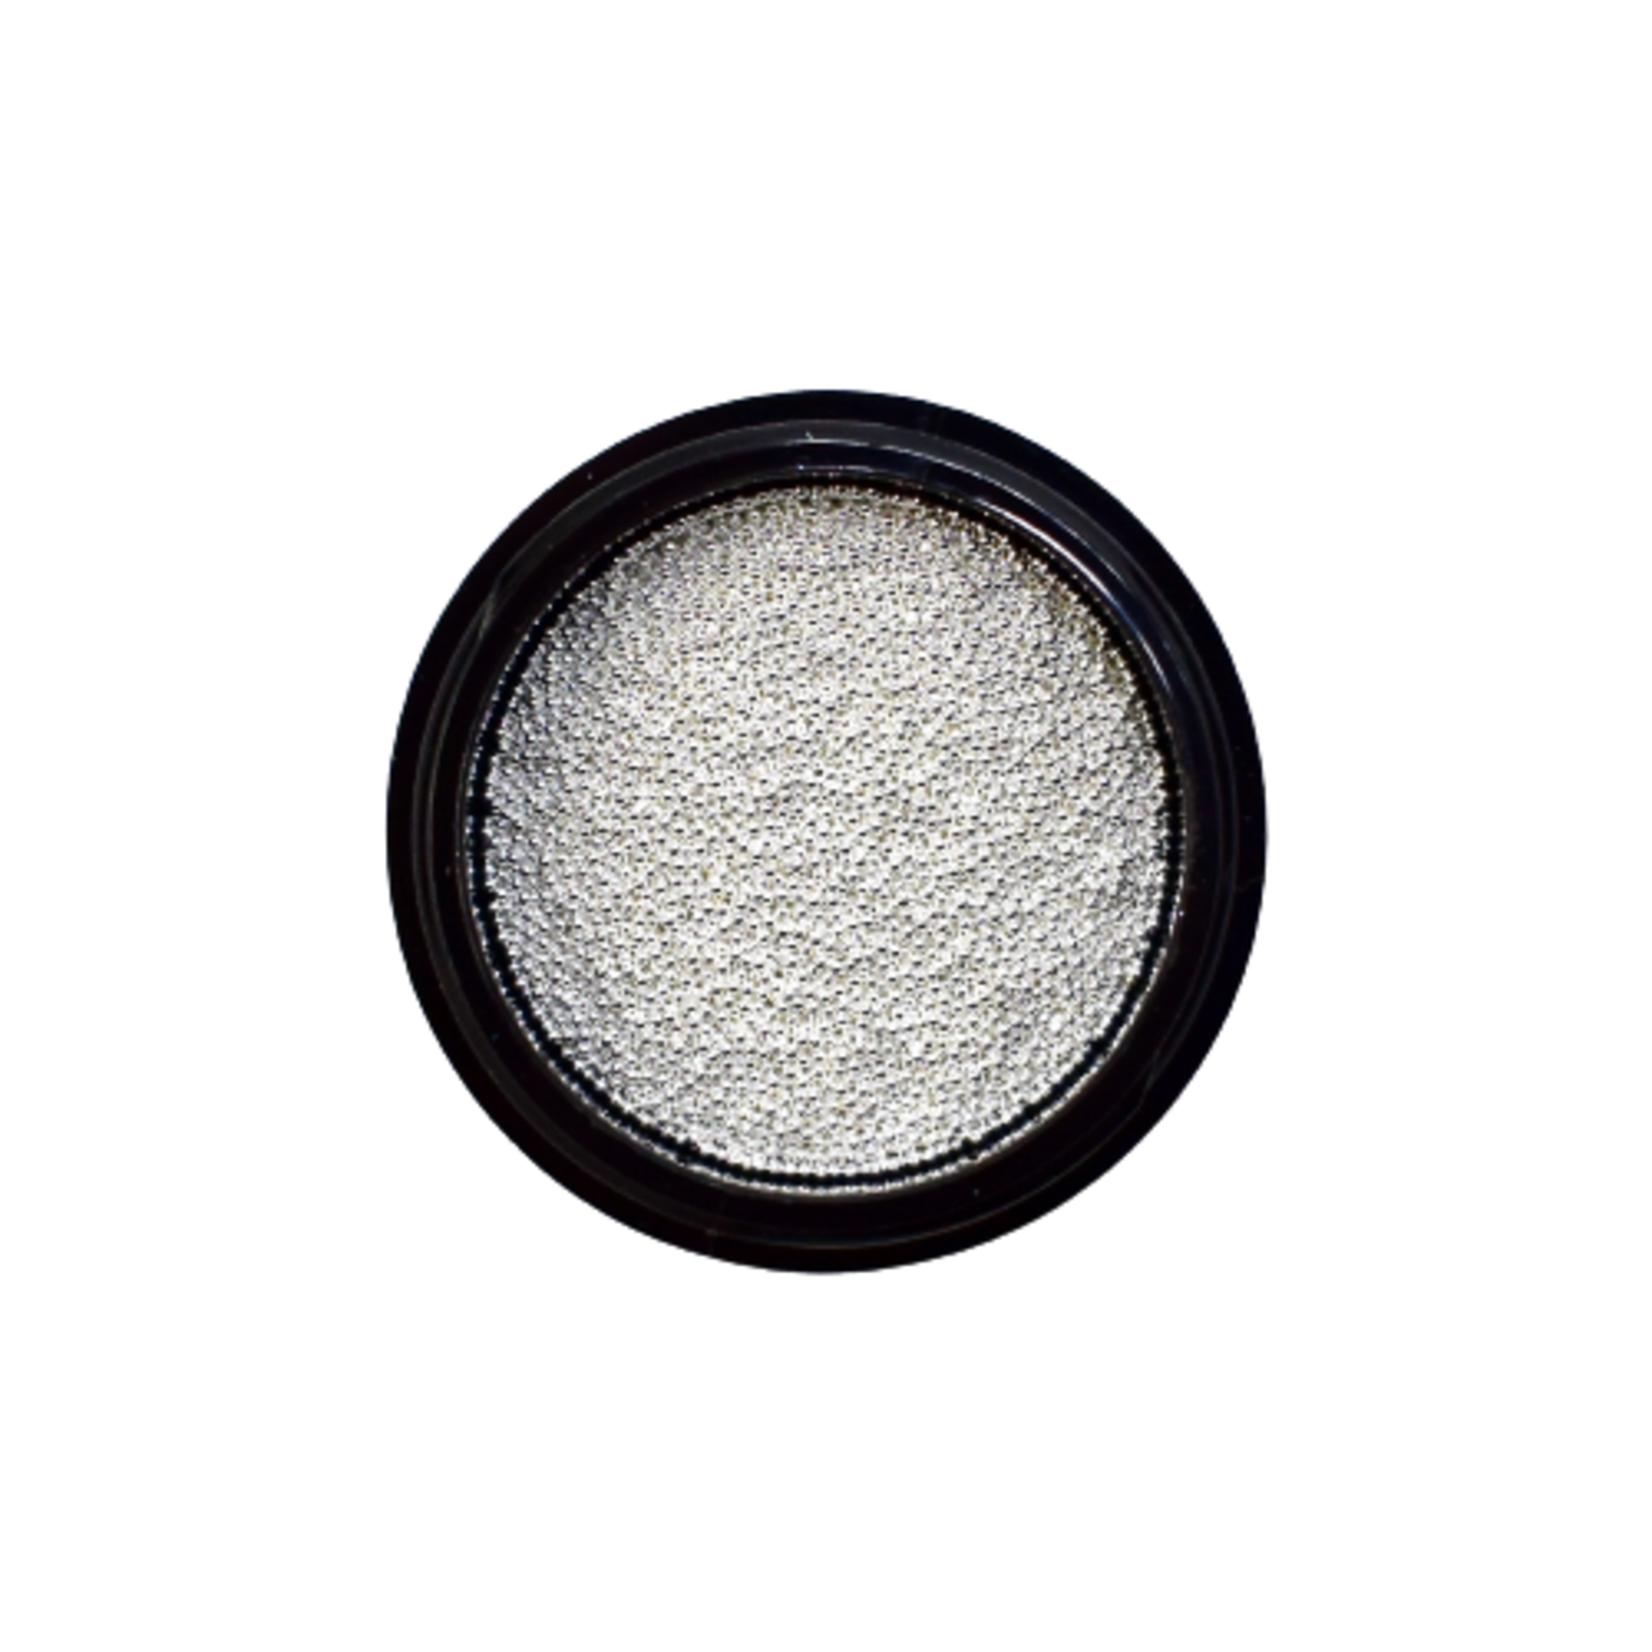 Urban Nails Caviar Beads Silver 0.4